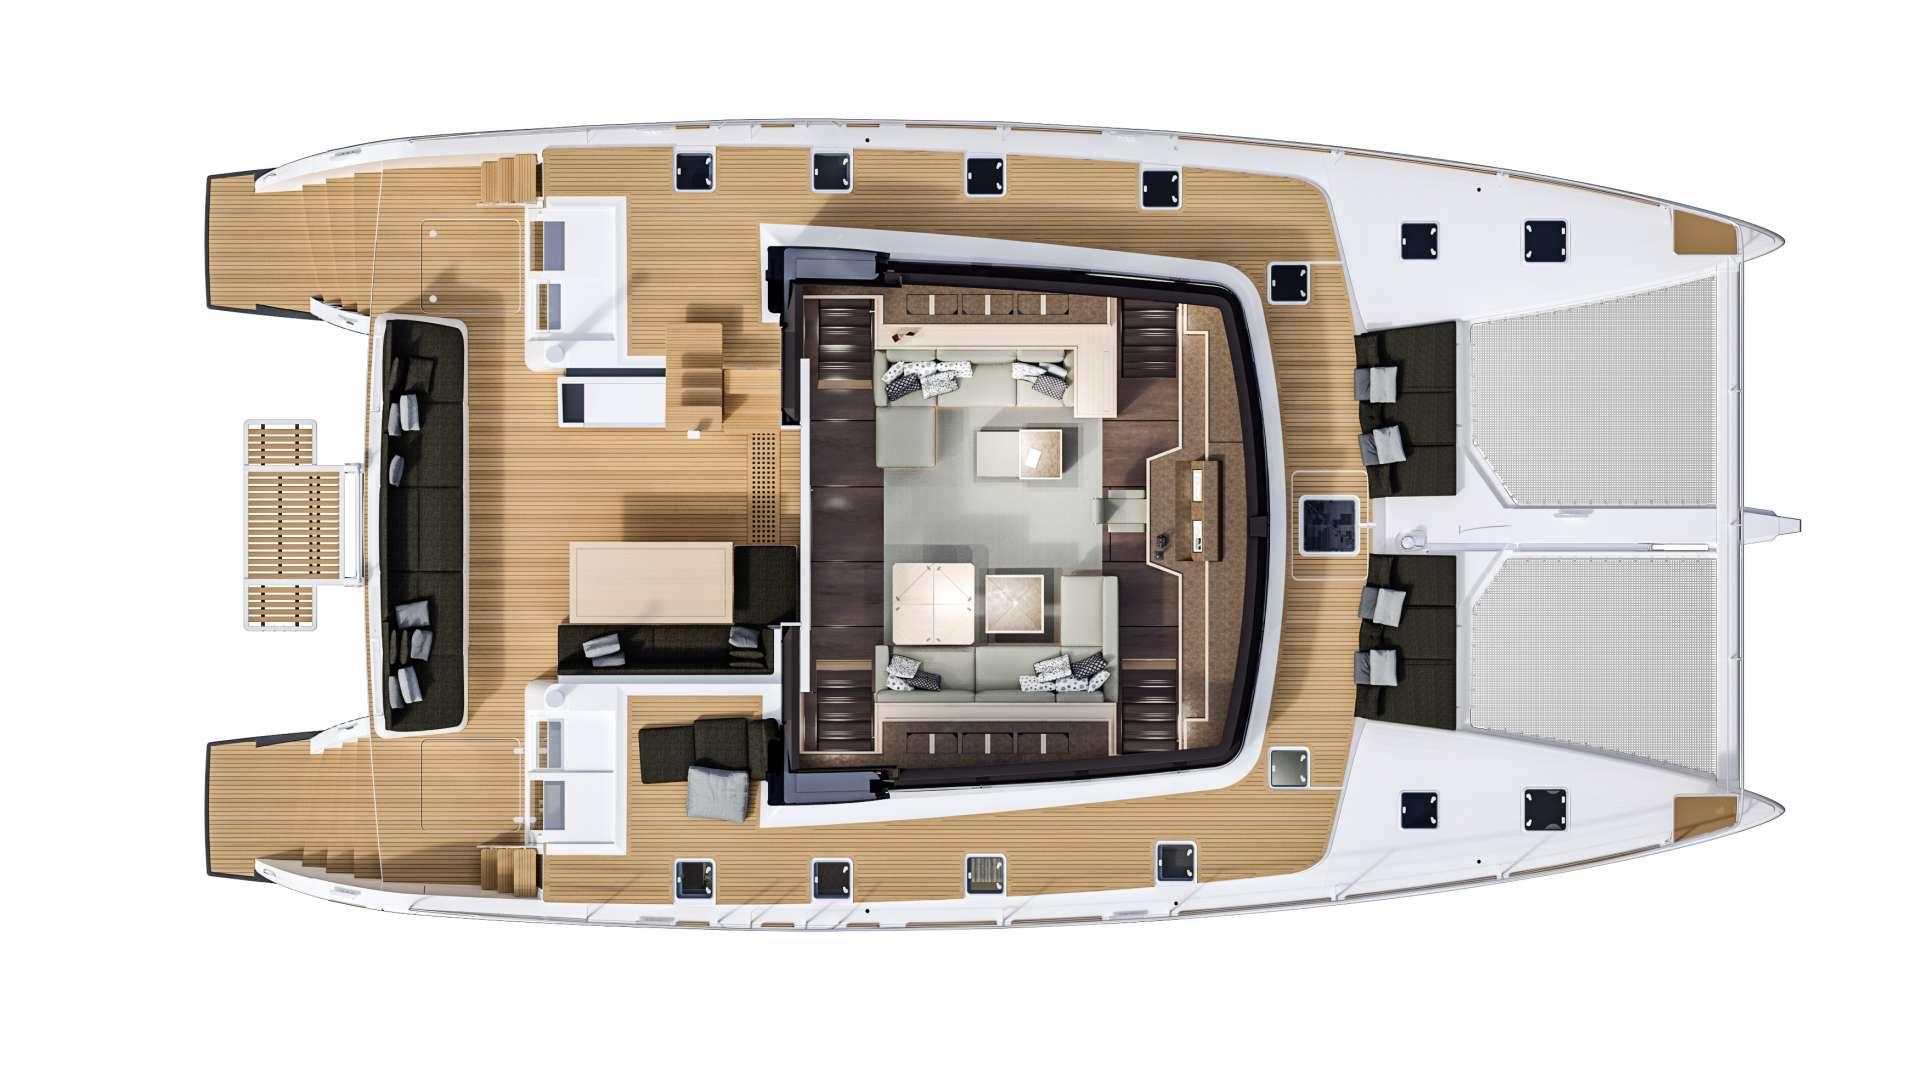 PLAYTIME 630 yacht image # 7